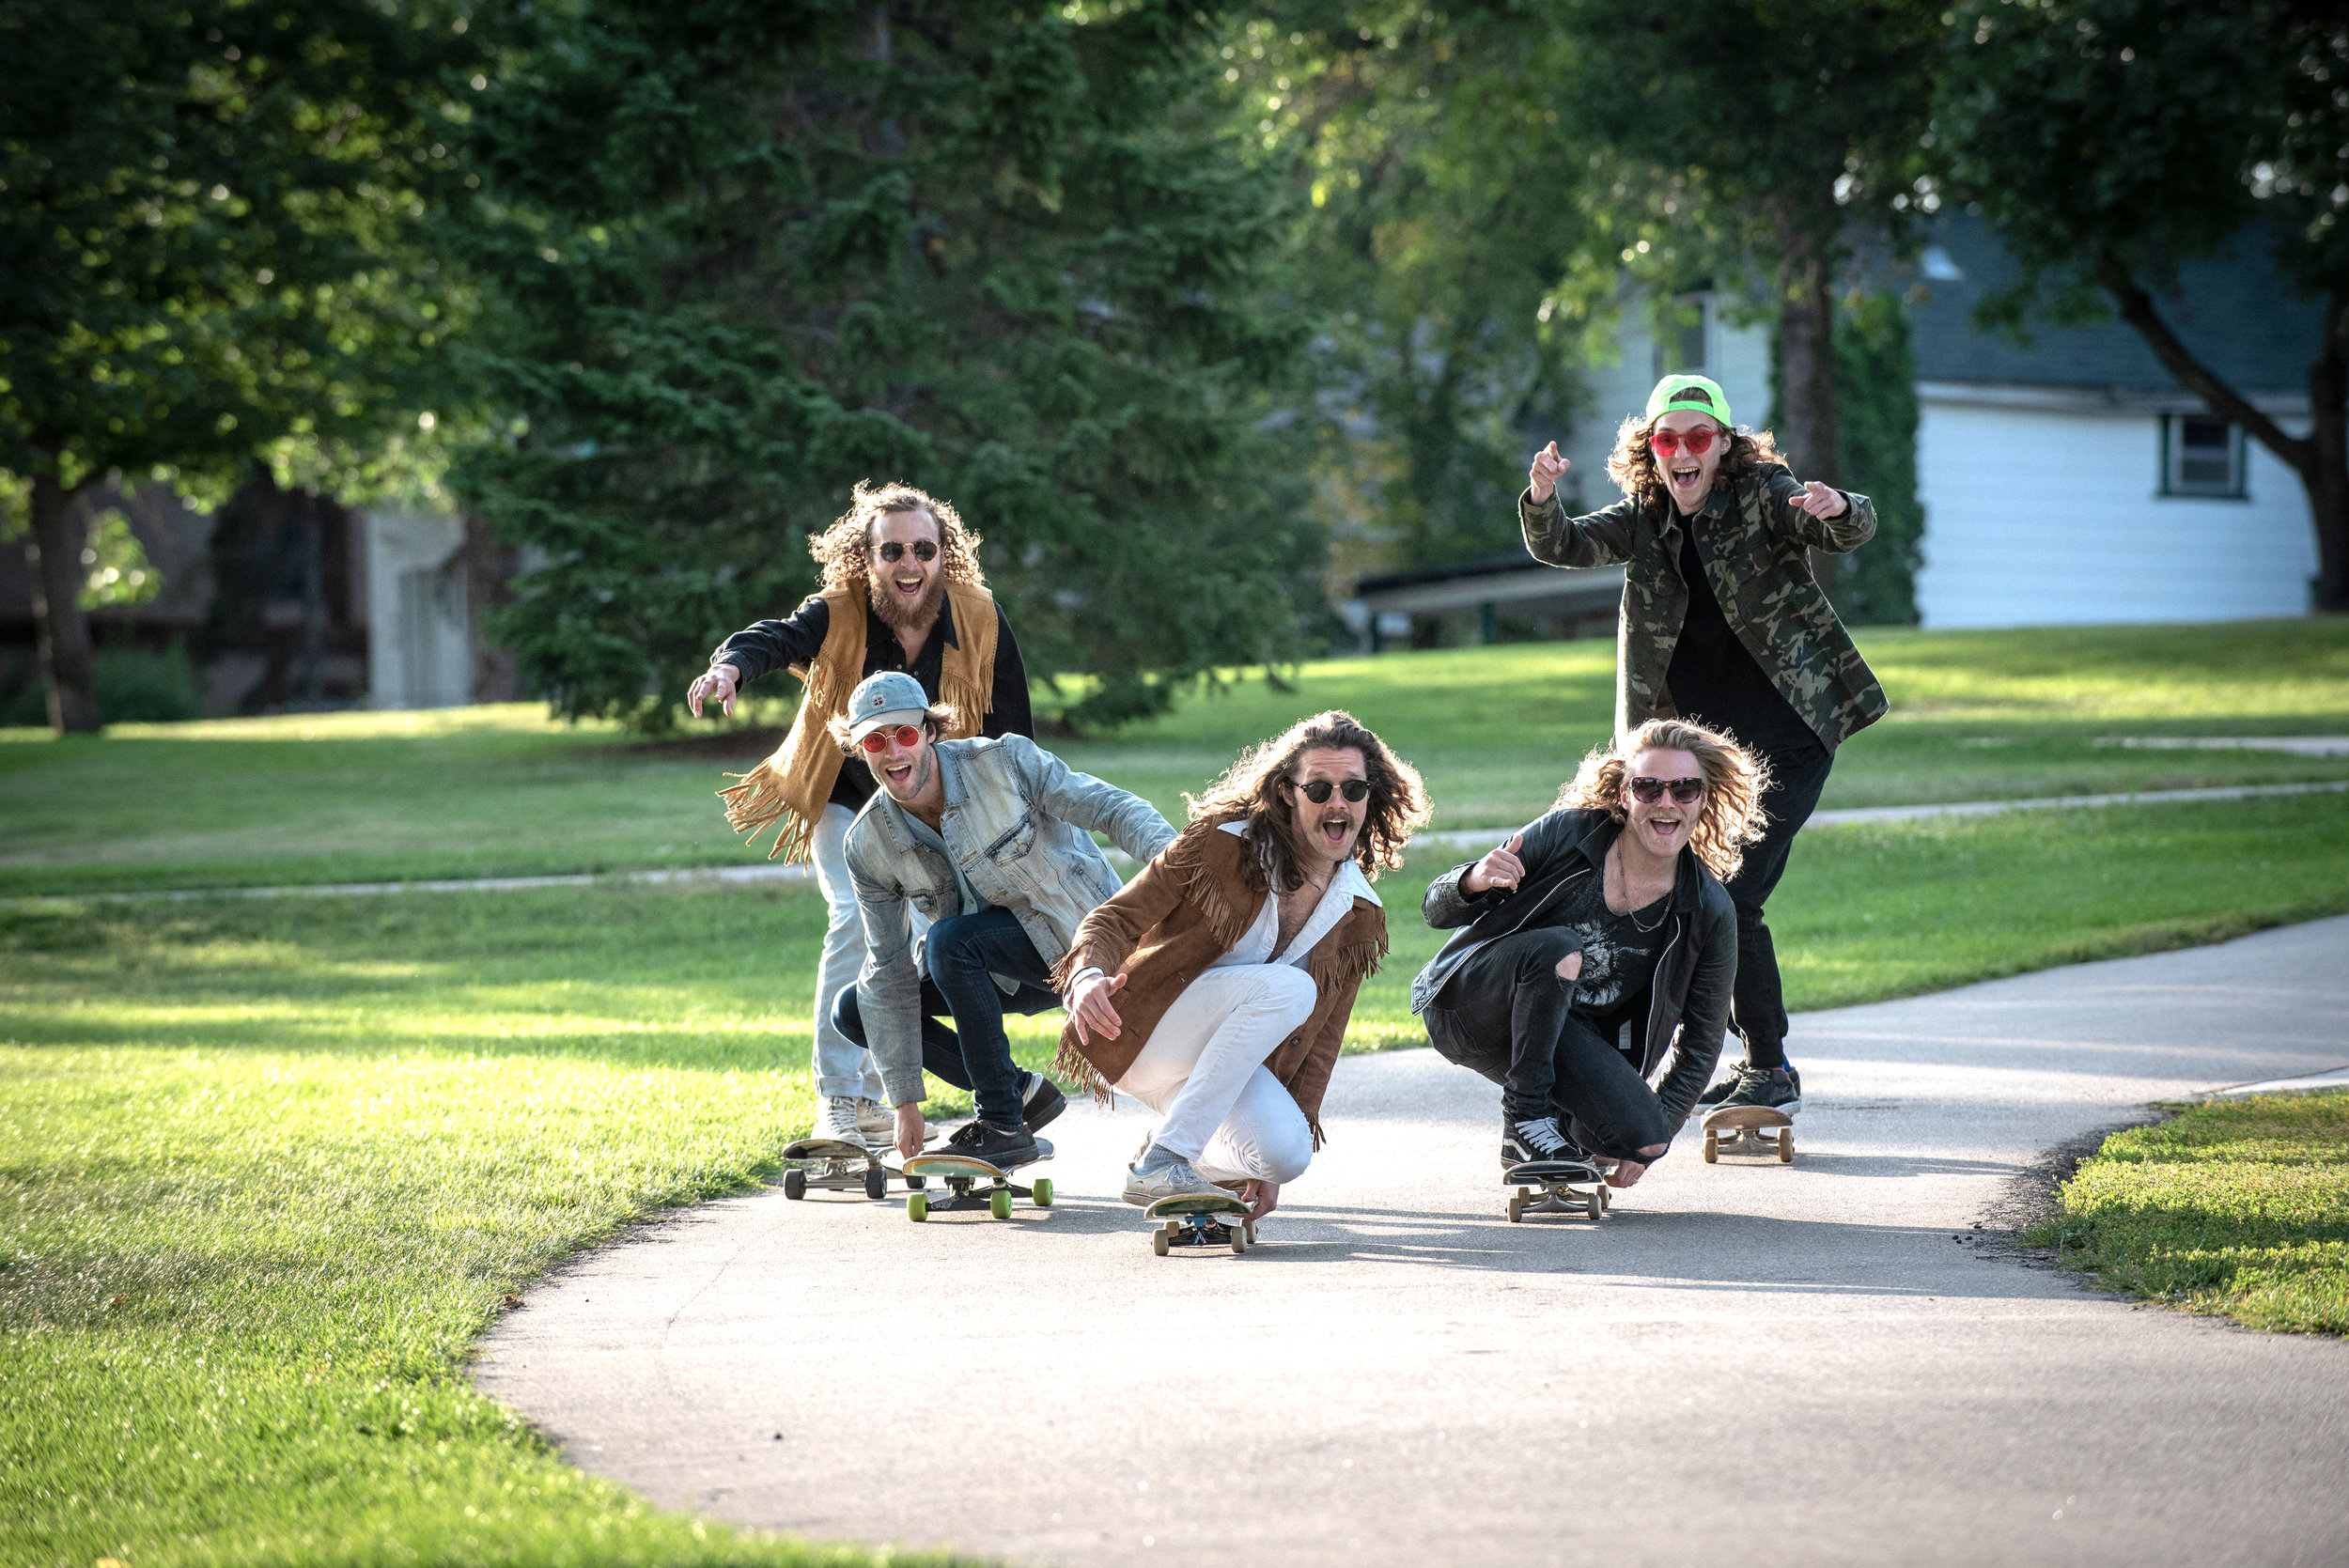 Bombargo Skateboarding - Jack Ogrady Photo.jpg